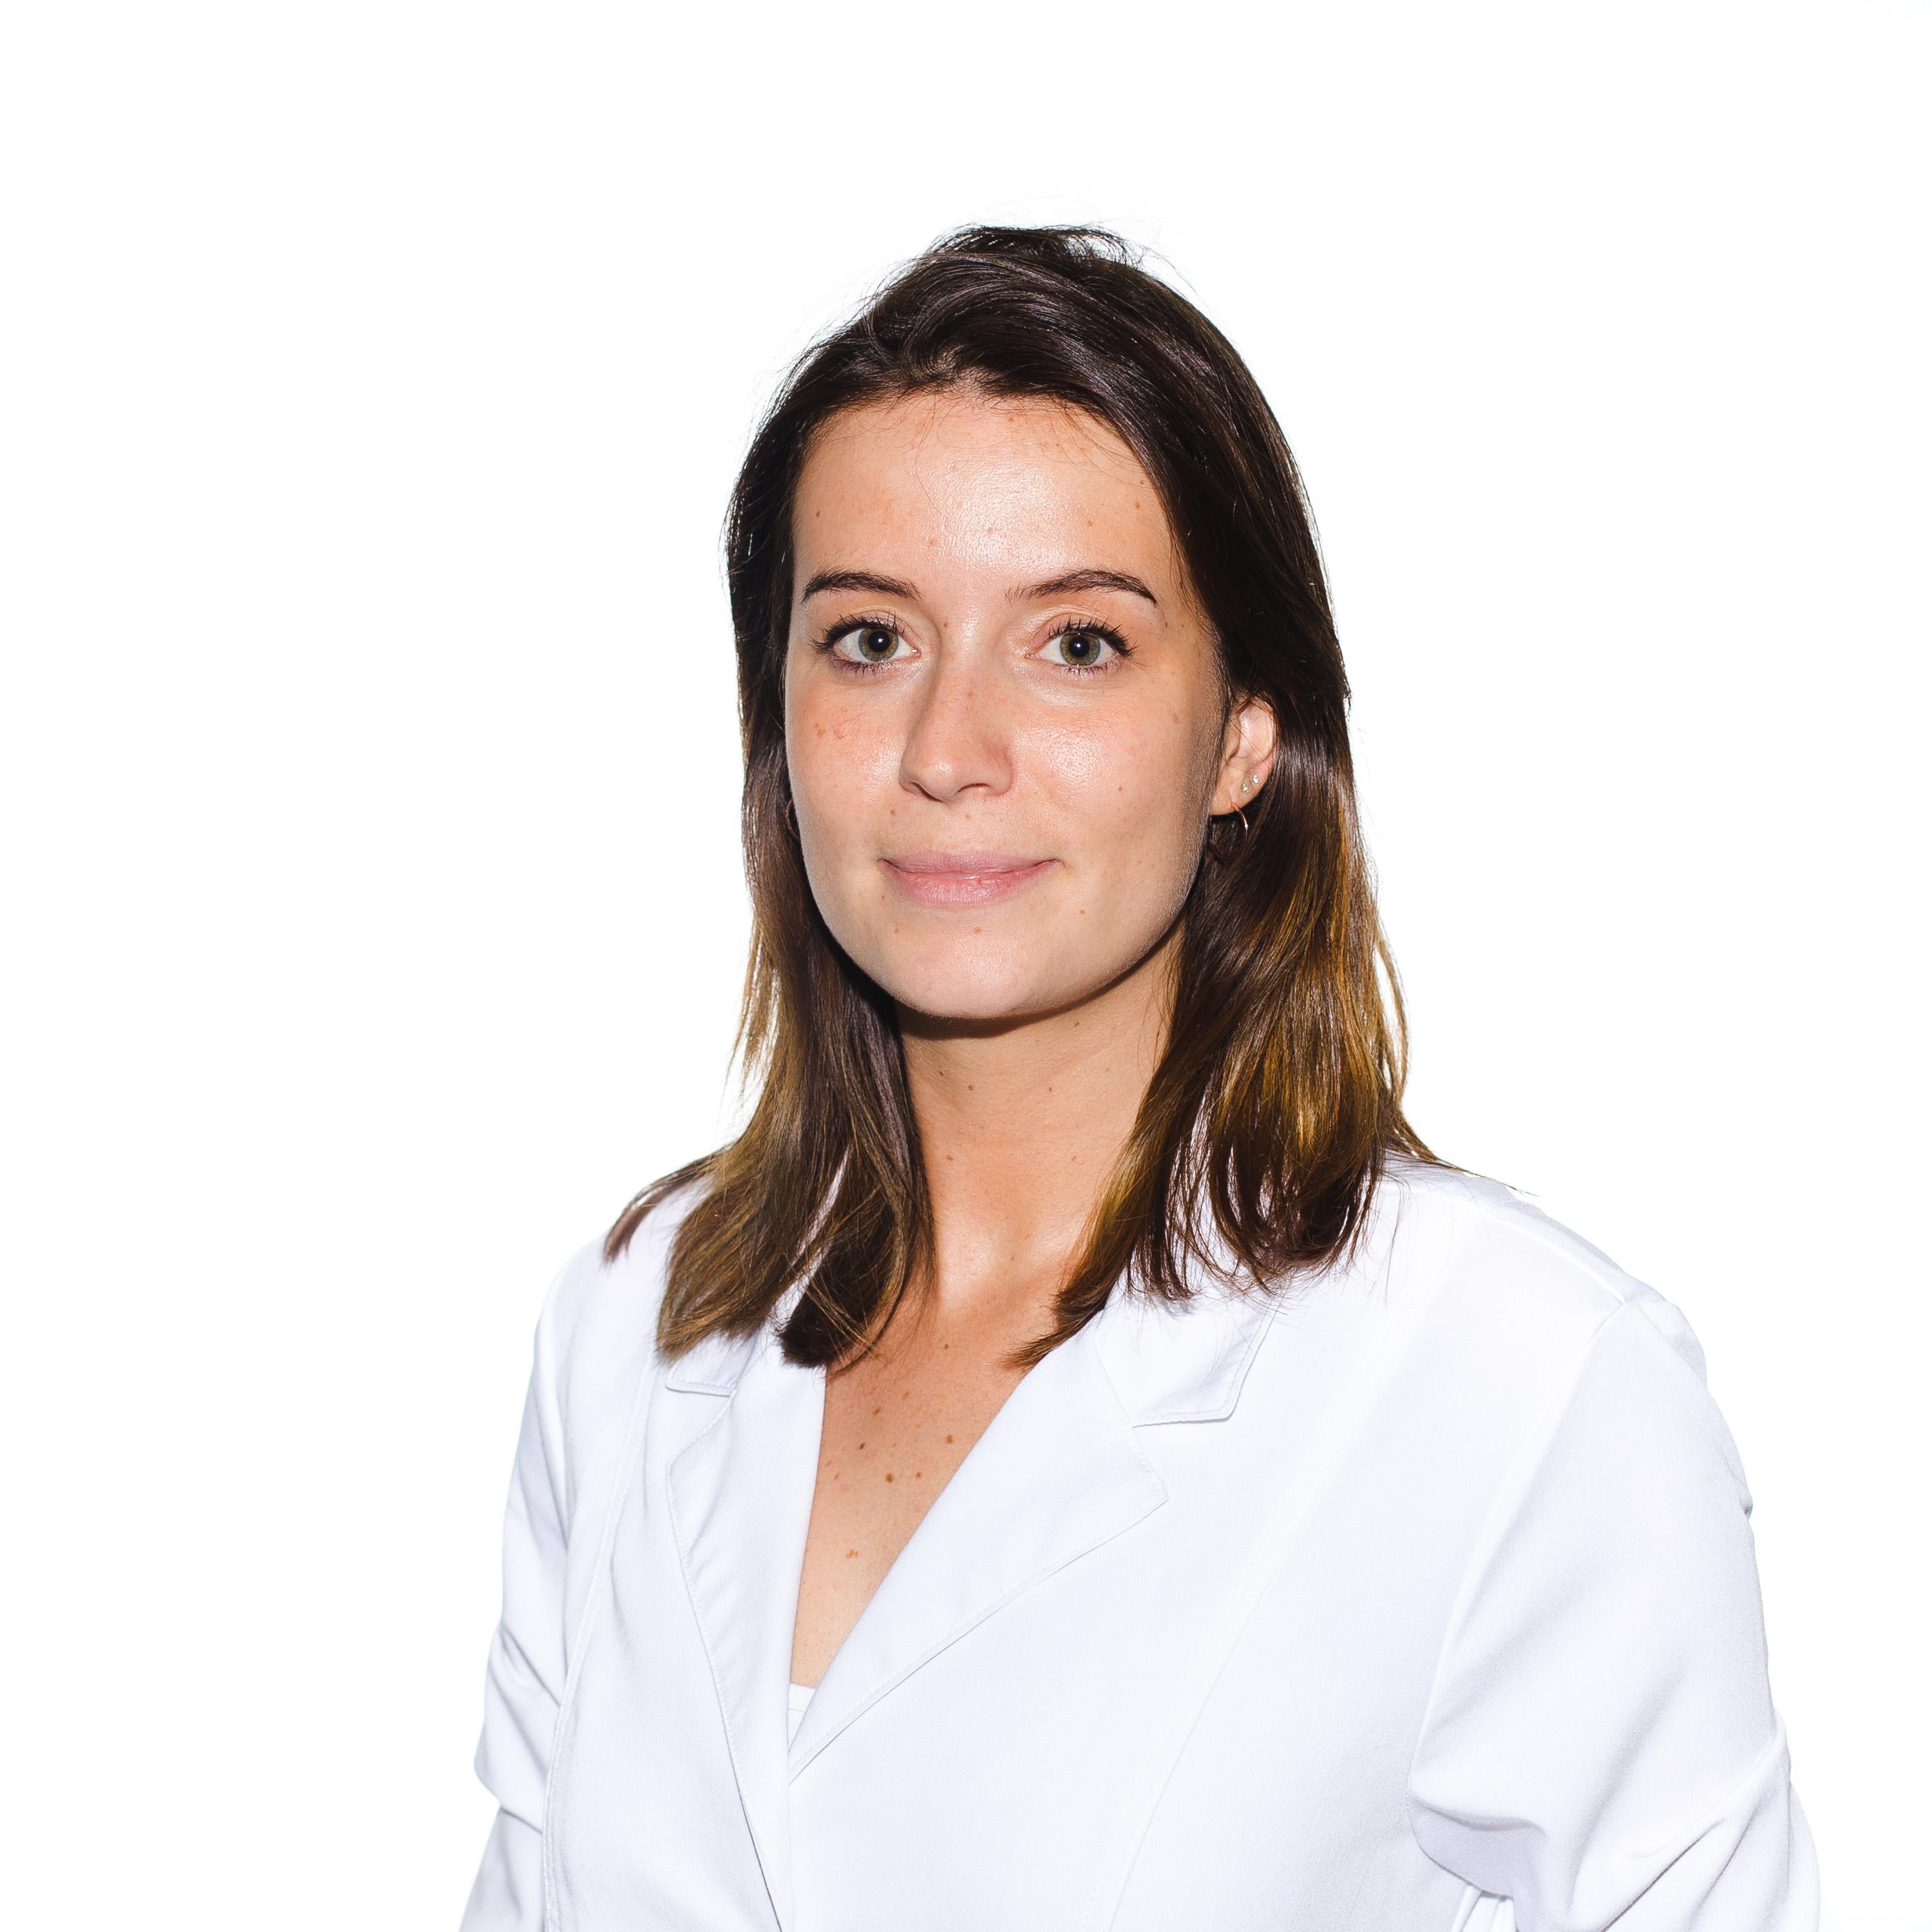 Dra. Carla Domínguez. Ginecologa